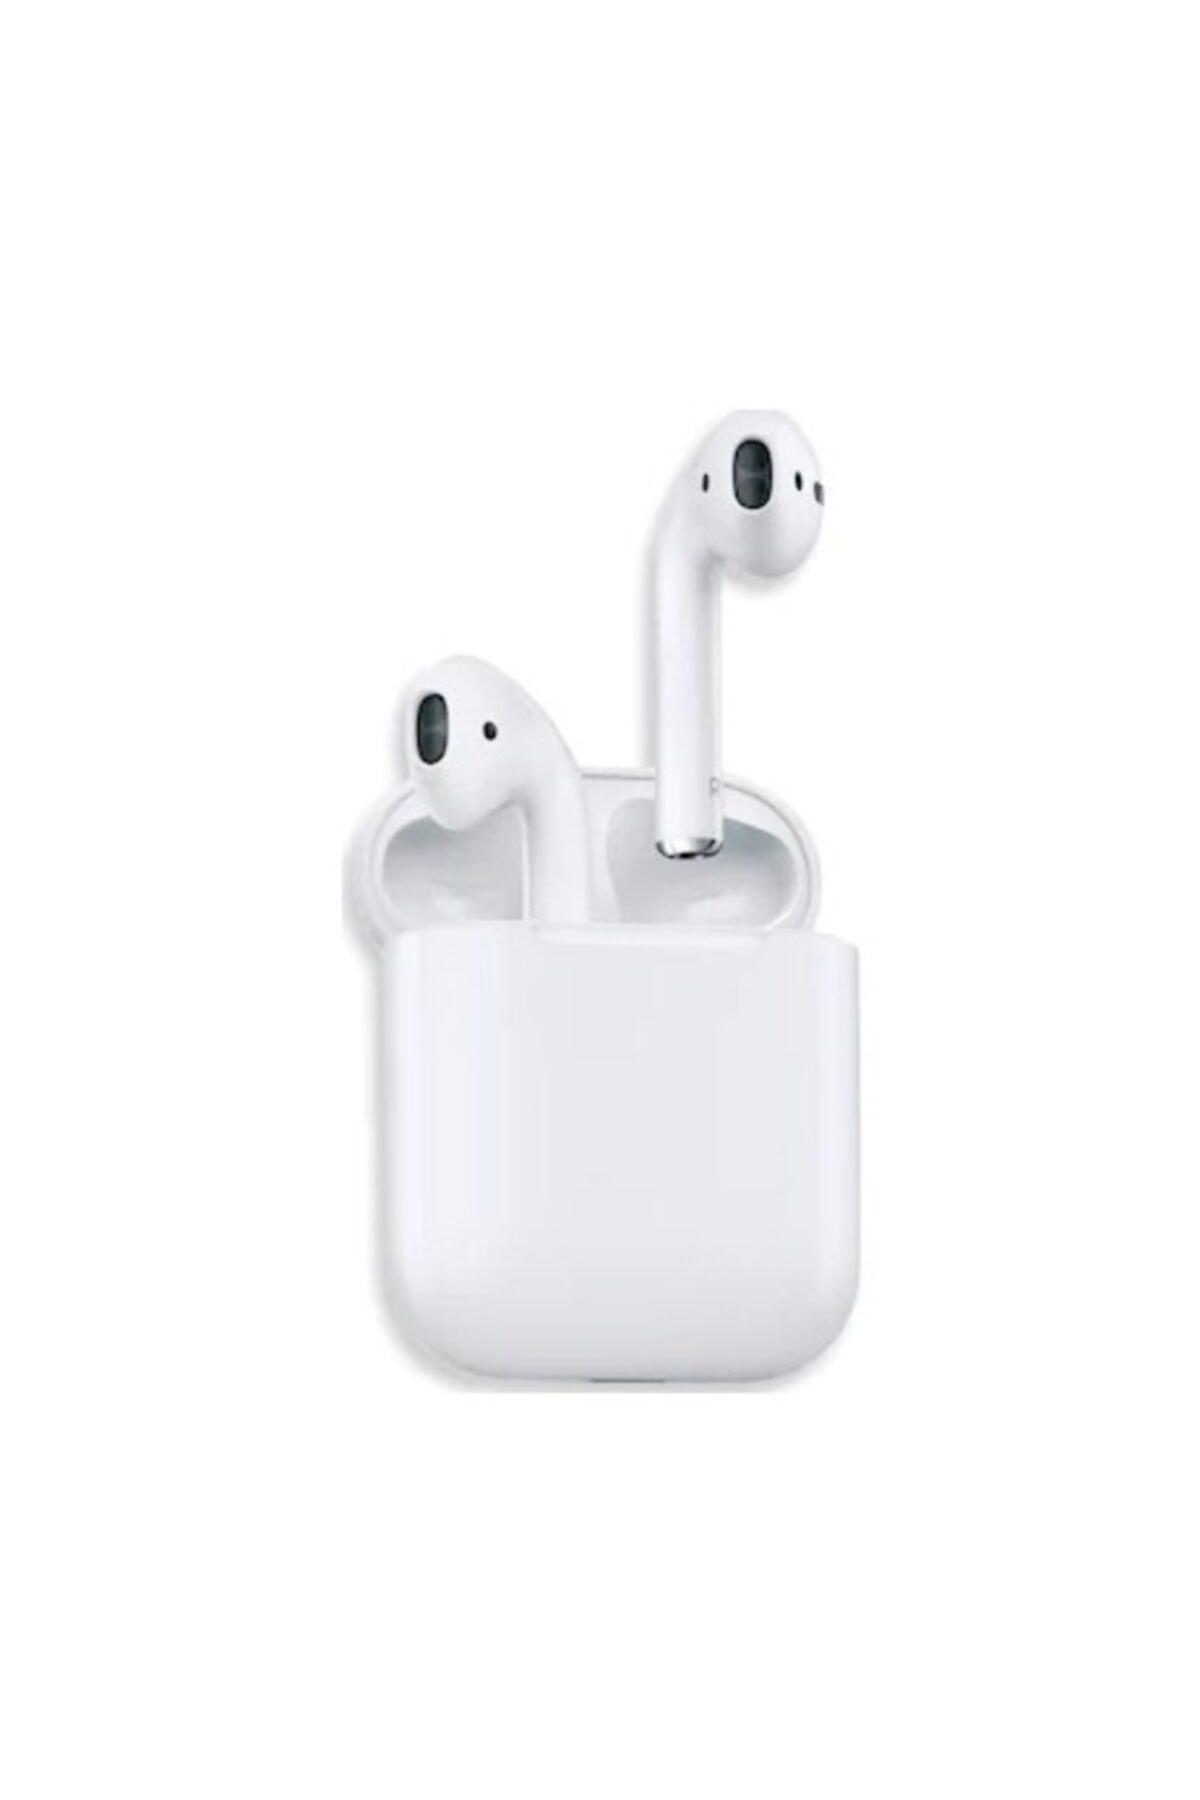 Tws Airpods TWS i12 Şarj Üniteli Bluetooth 5.0 Kulaklık 1